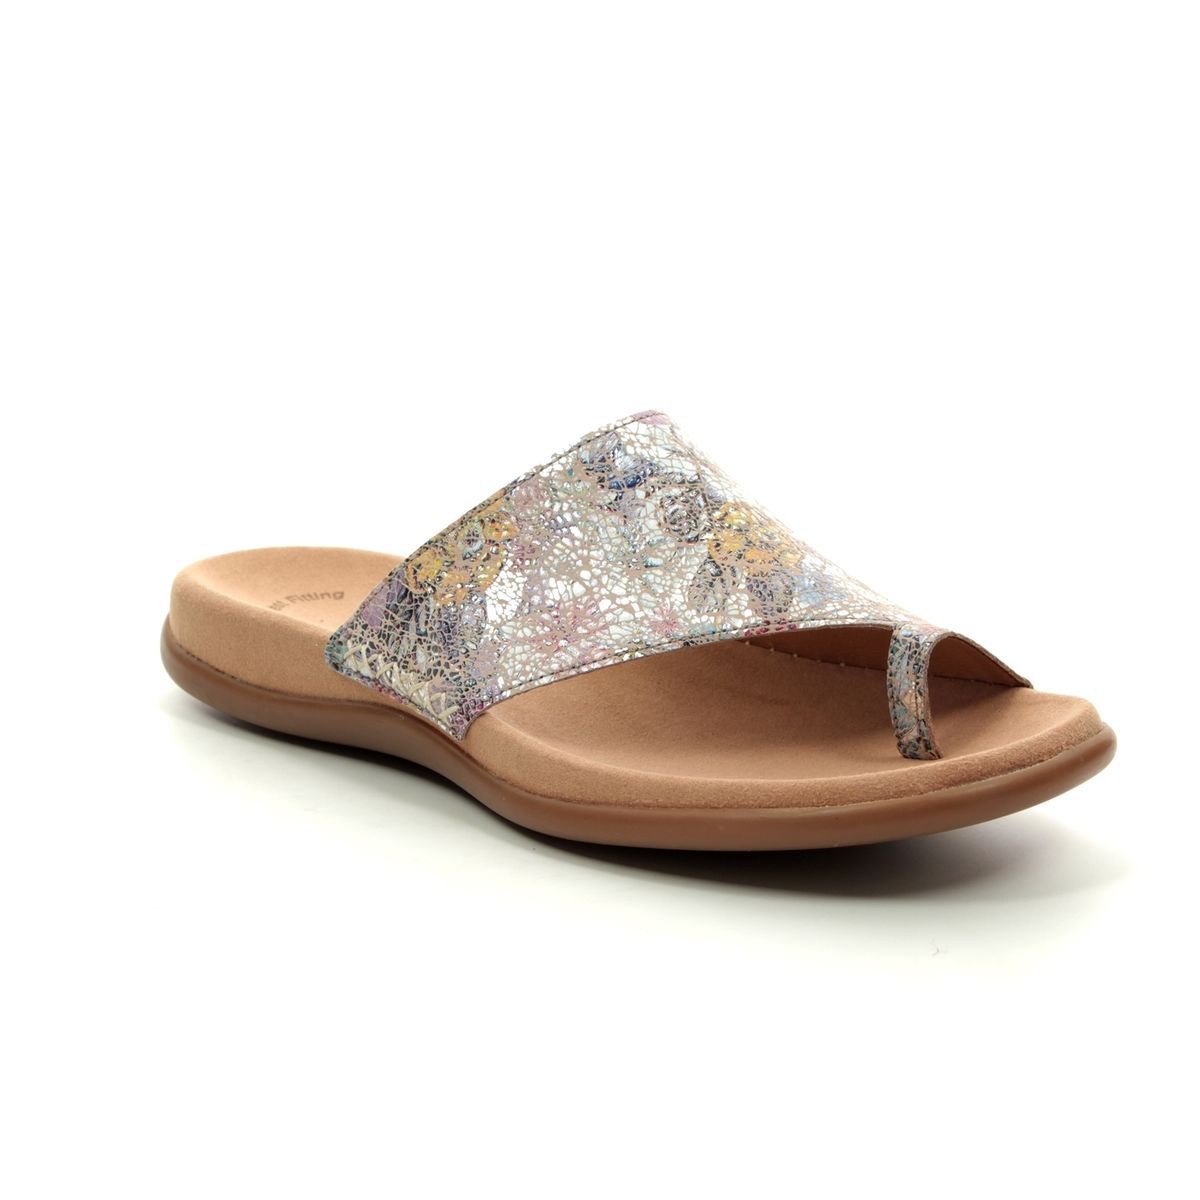 edd9bda2442 Gabor Slide Sandals - Floral print - 23.700.53 LANZAROTE